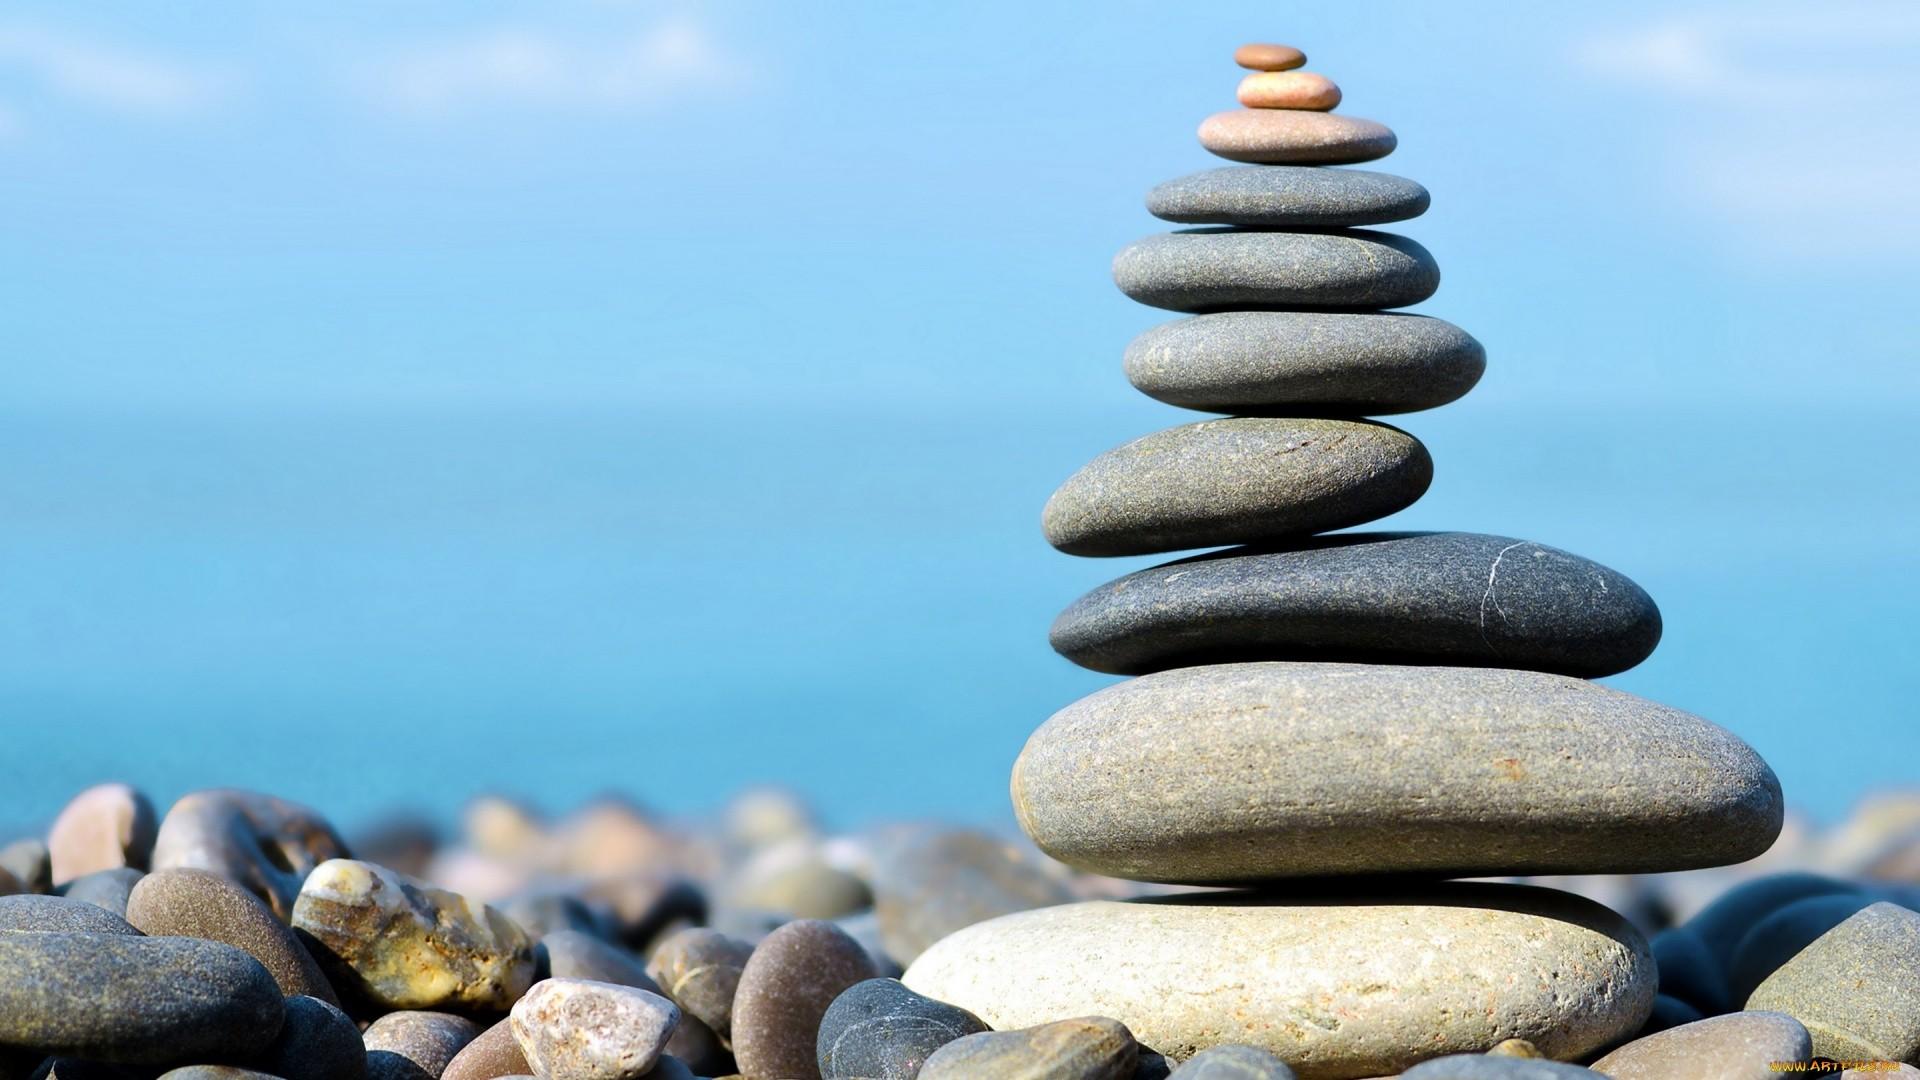 Zen Stone Pyramid Image